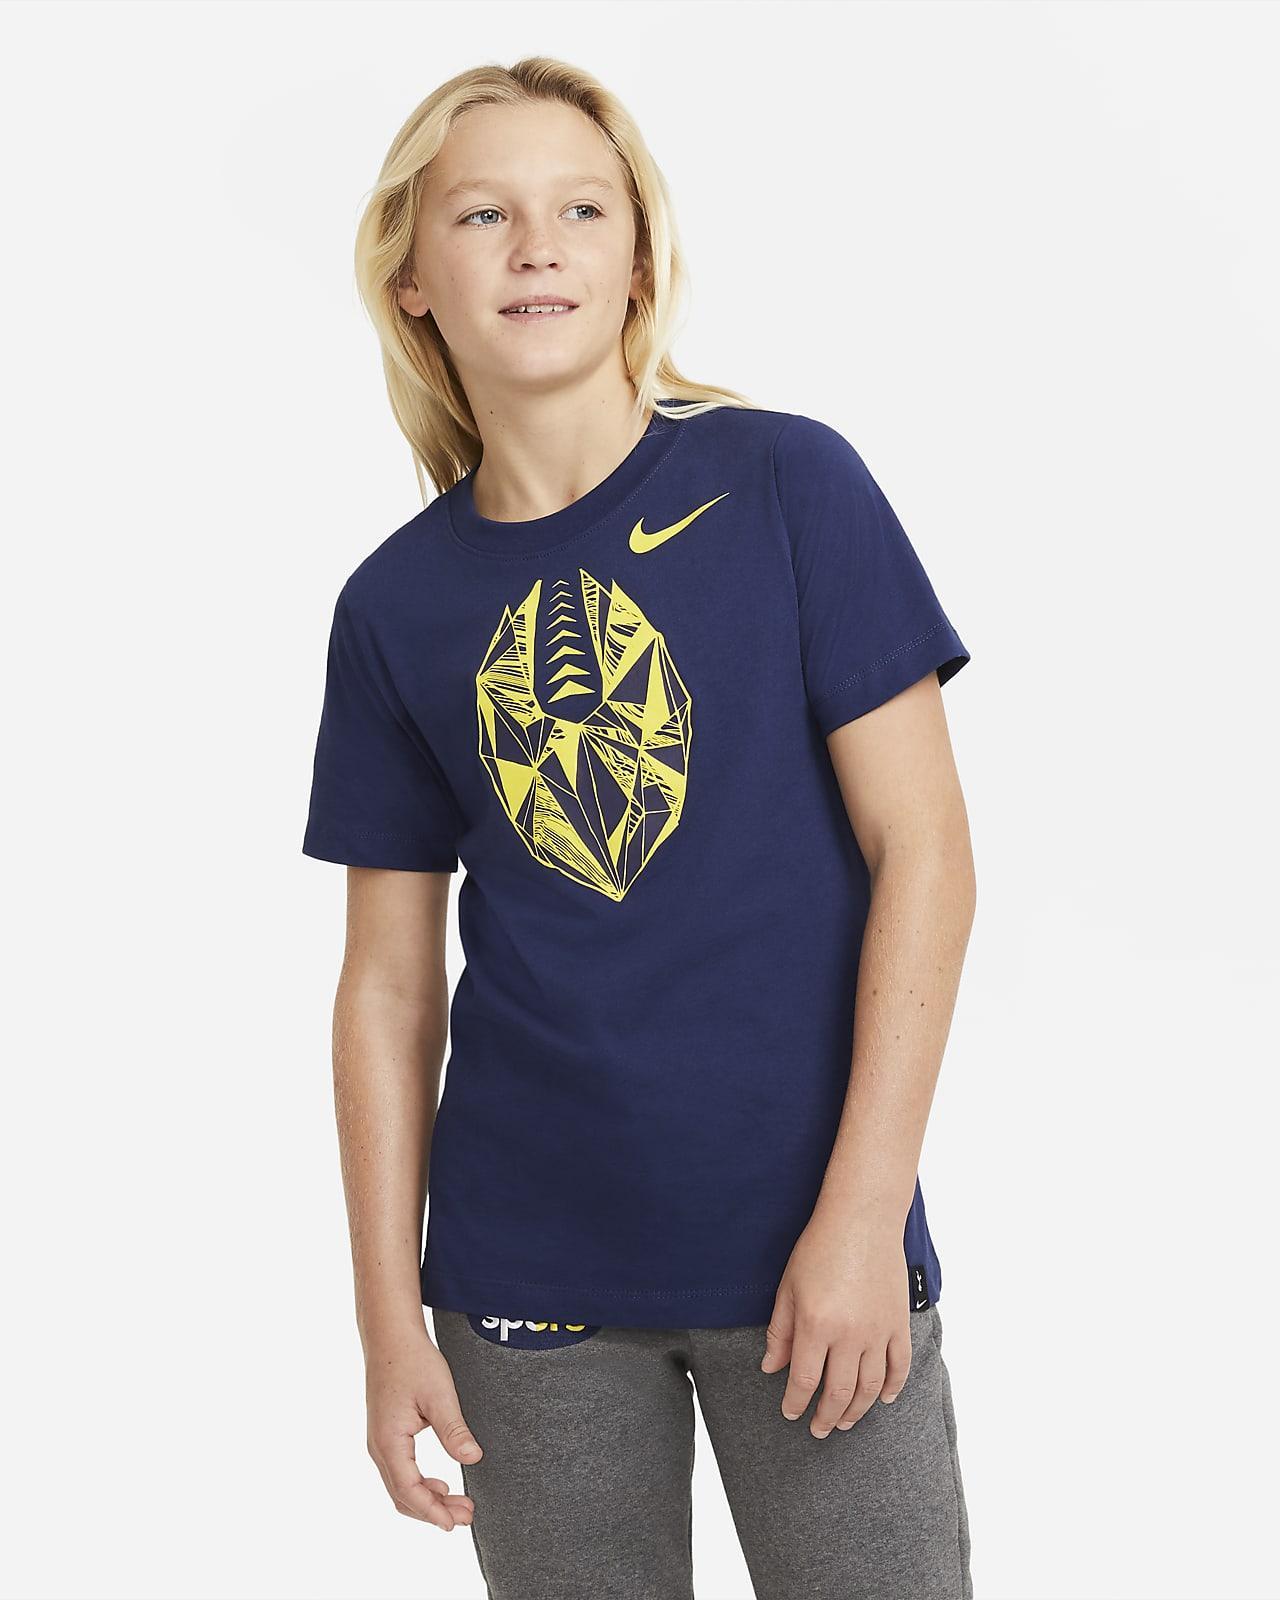 Tottenham Hotspur Older Kids' Football T-Shirt